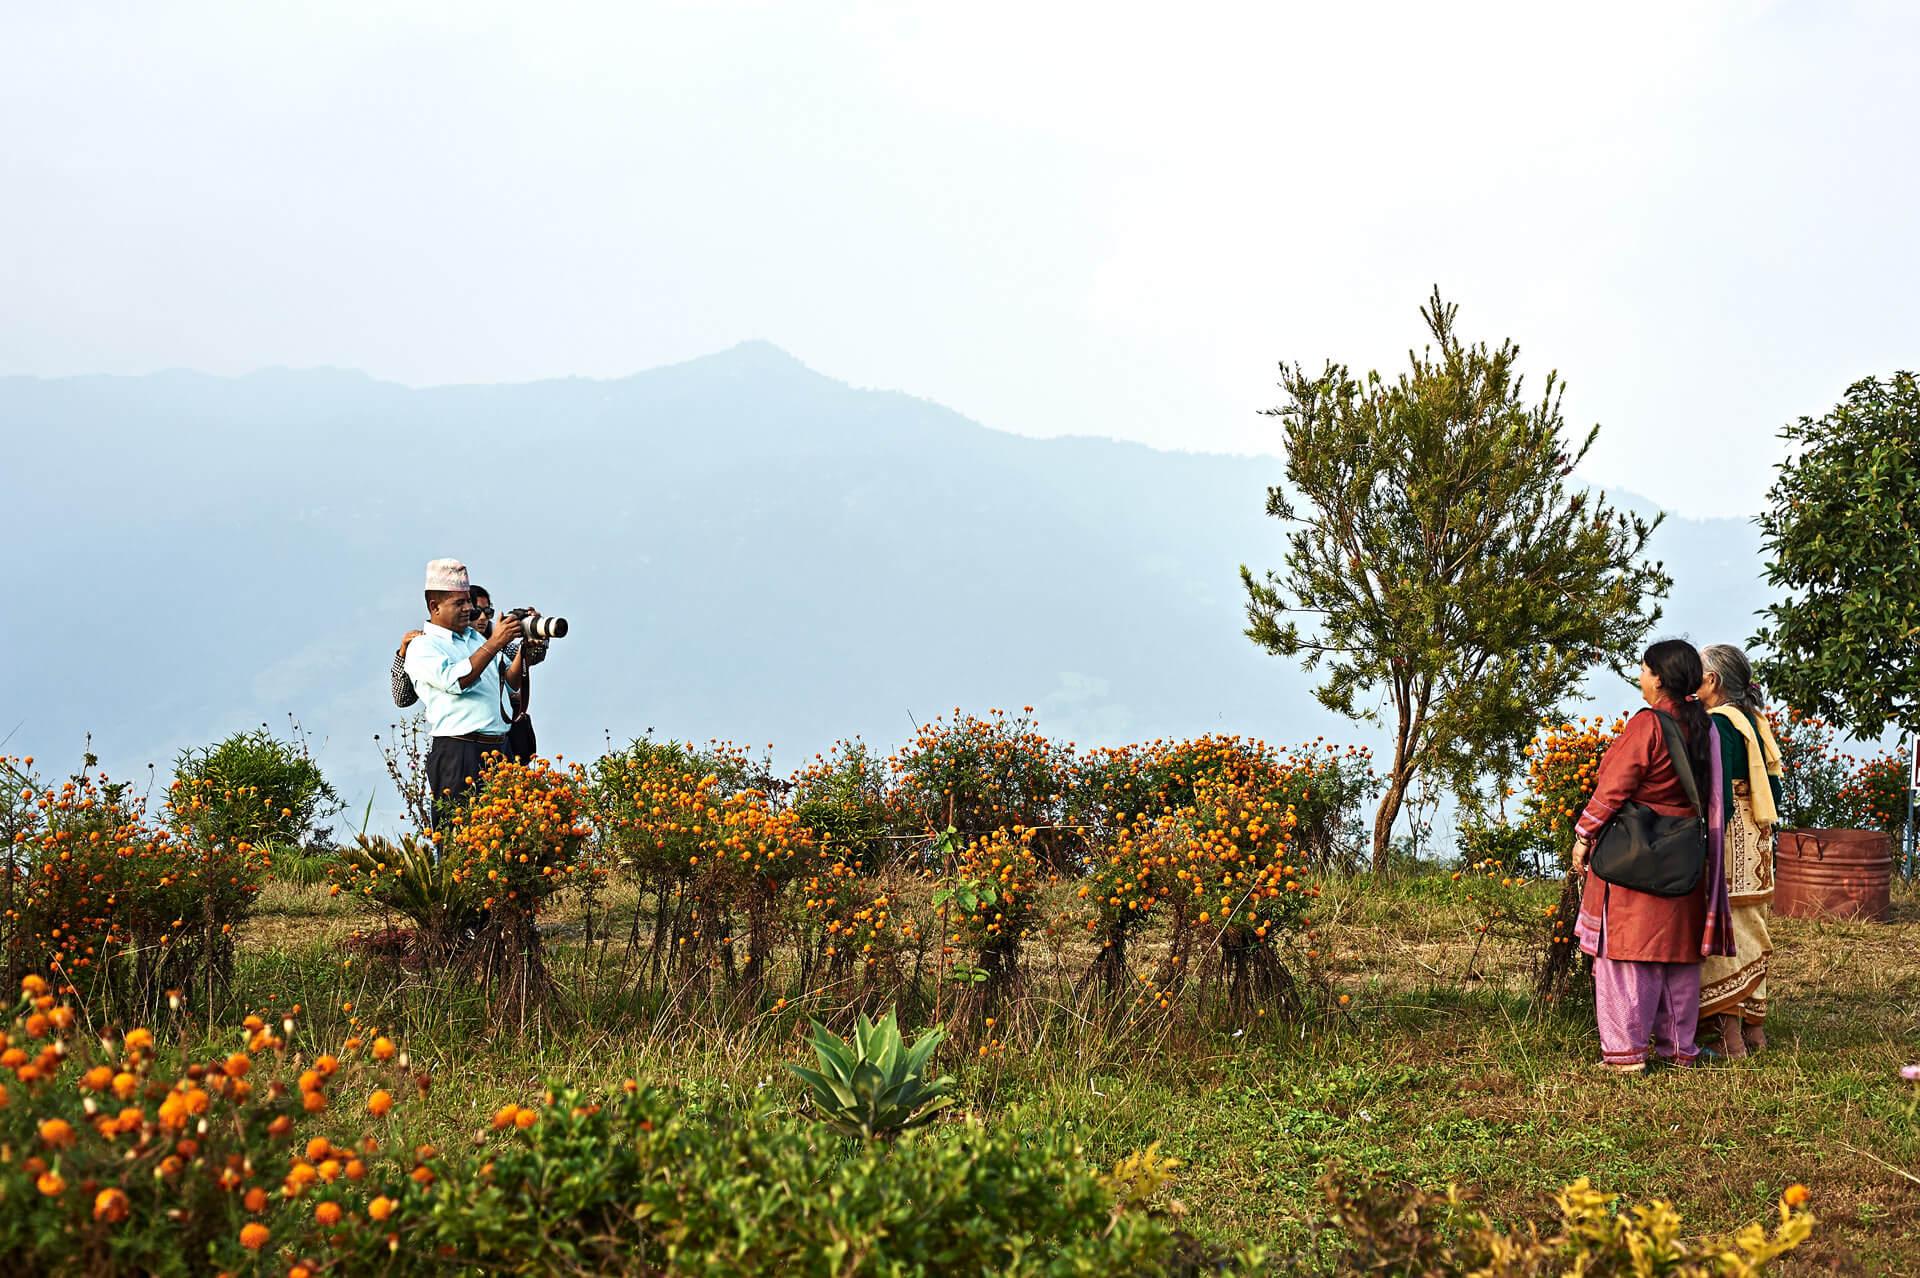 nepal_pokhara_20131029_0225-Kopie